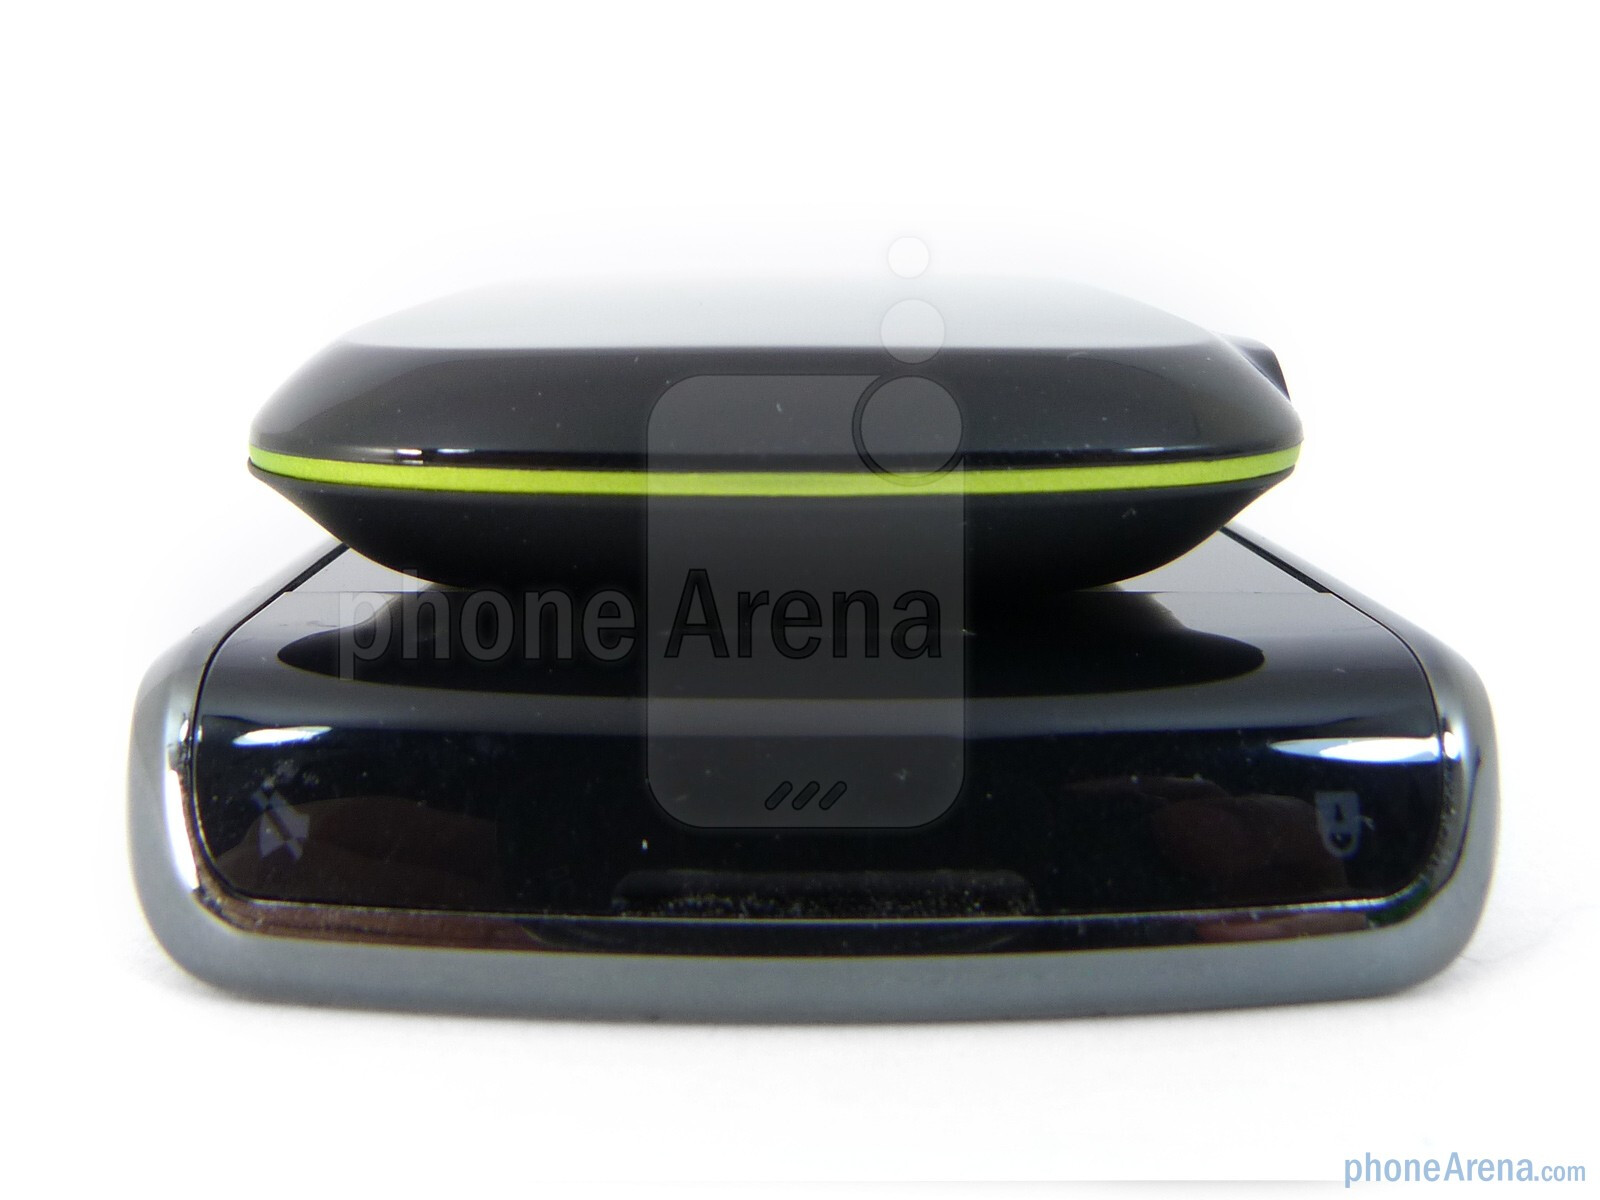 T-Mobile 4G Mobile Hotspot Review - PhoneArena